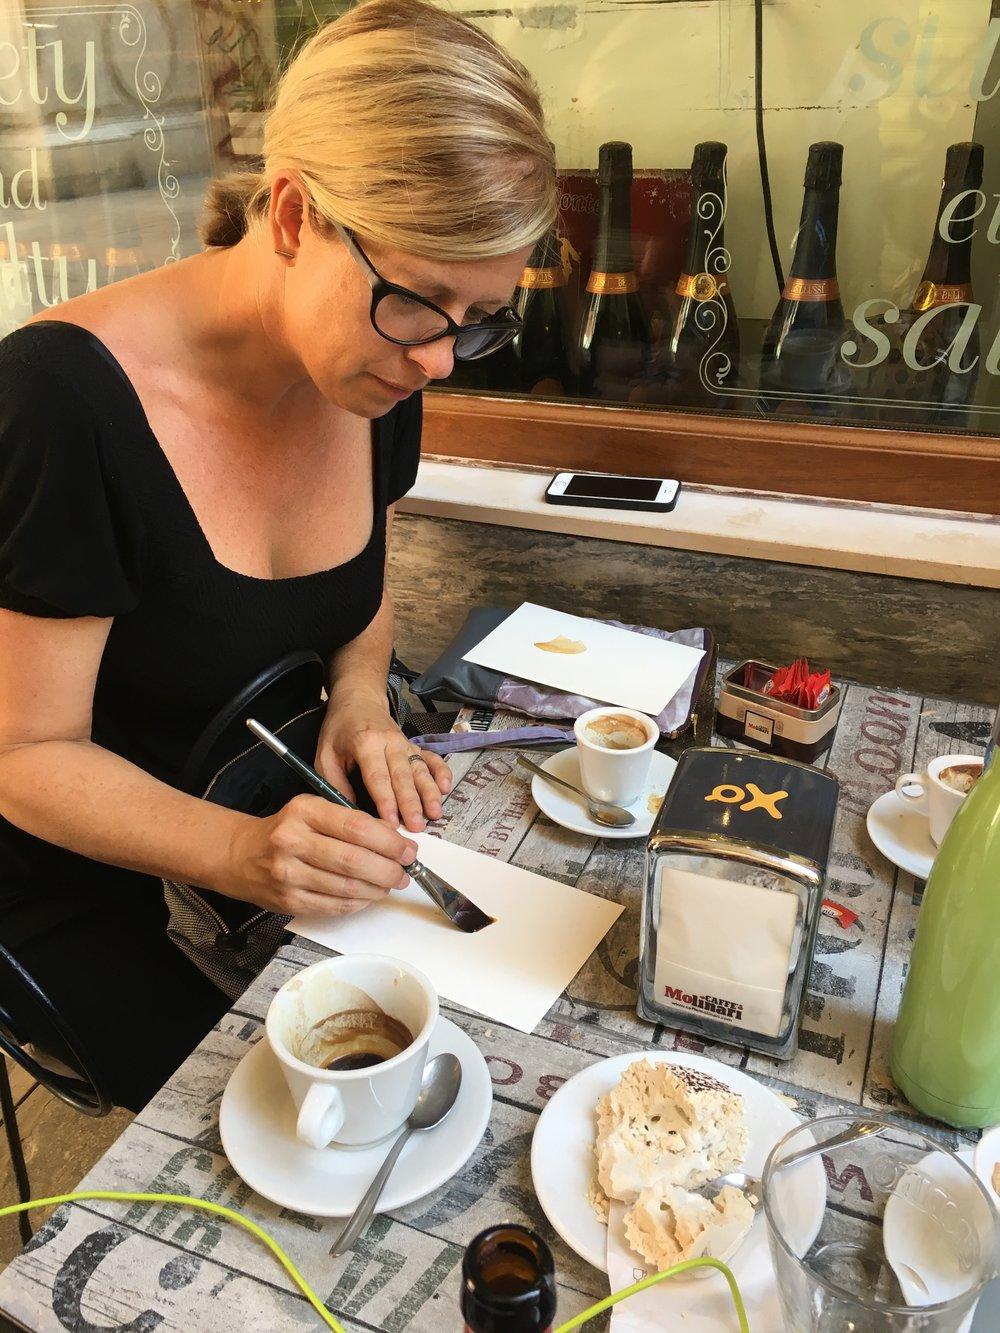 Danielle Krysa painting with coffee in a Venetian café